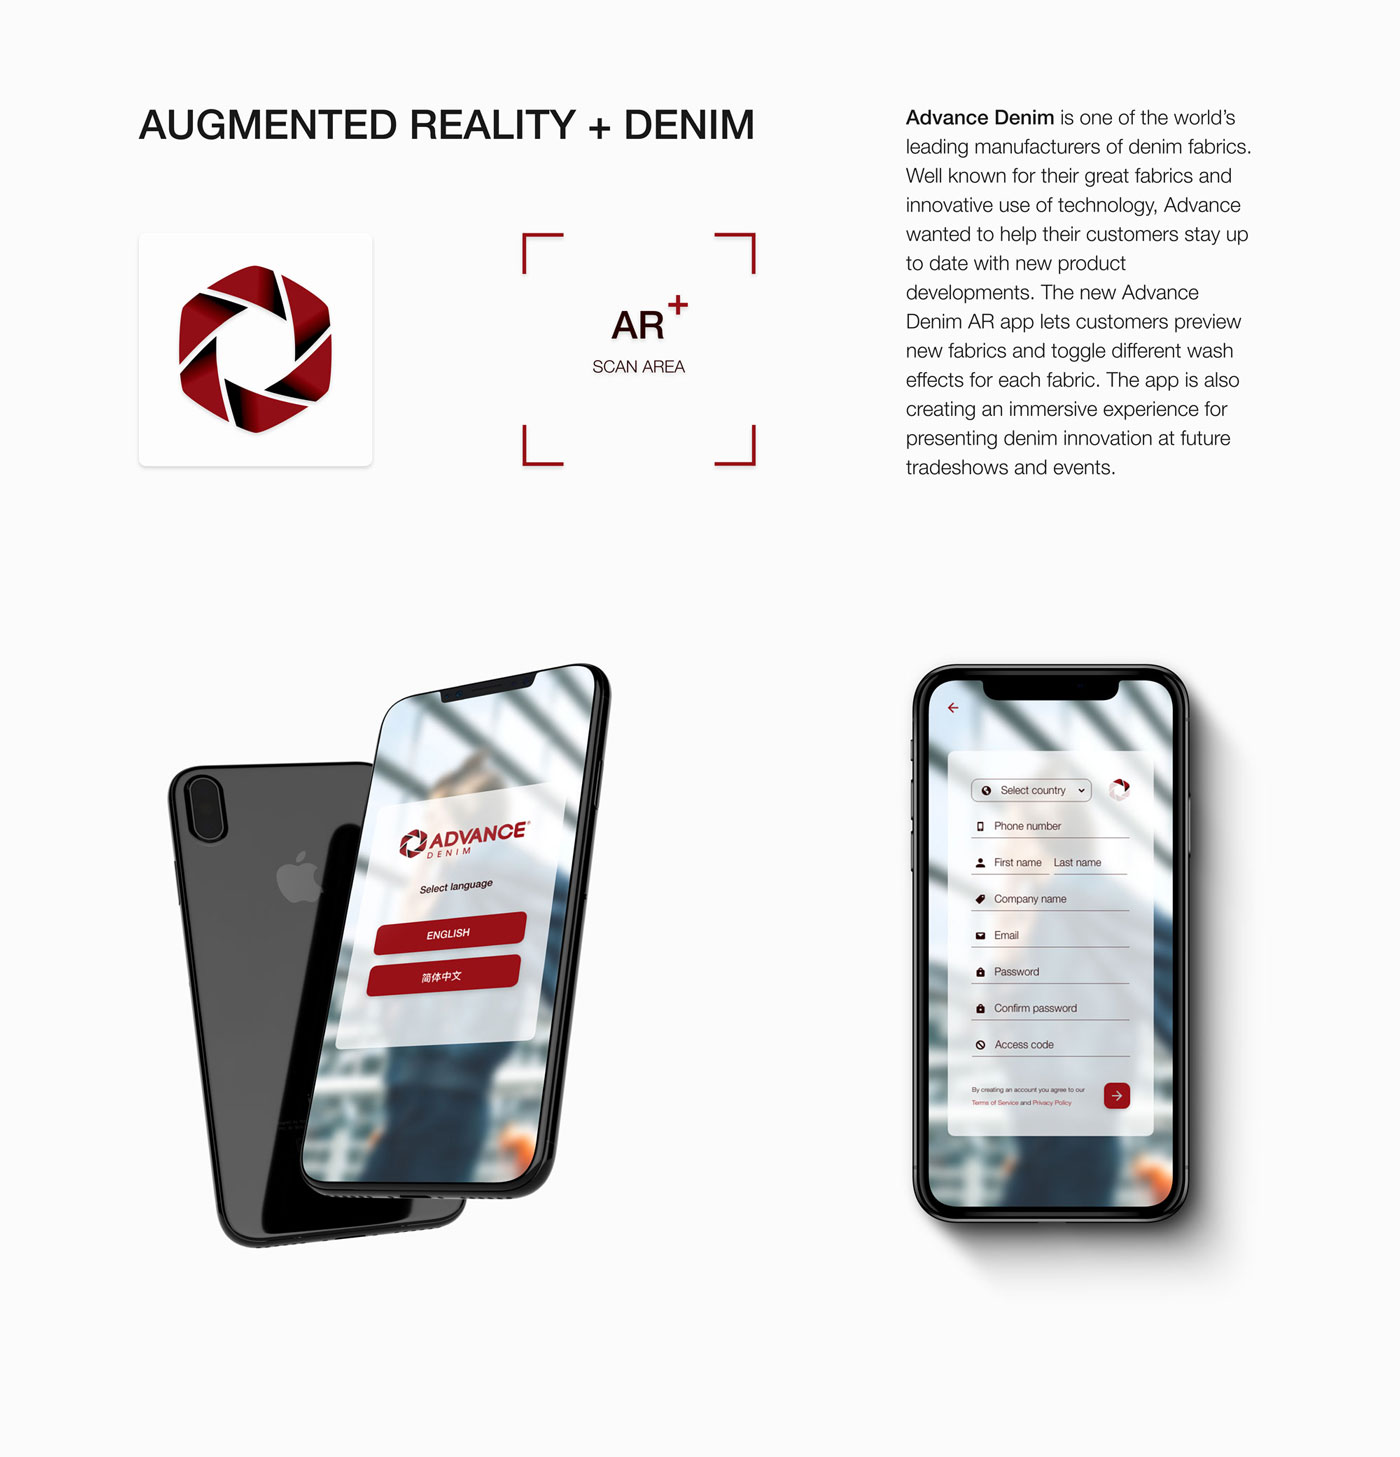 NEO-ARX_Advance_denim_mobile_app_Augmented_reality